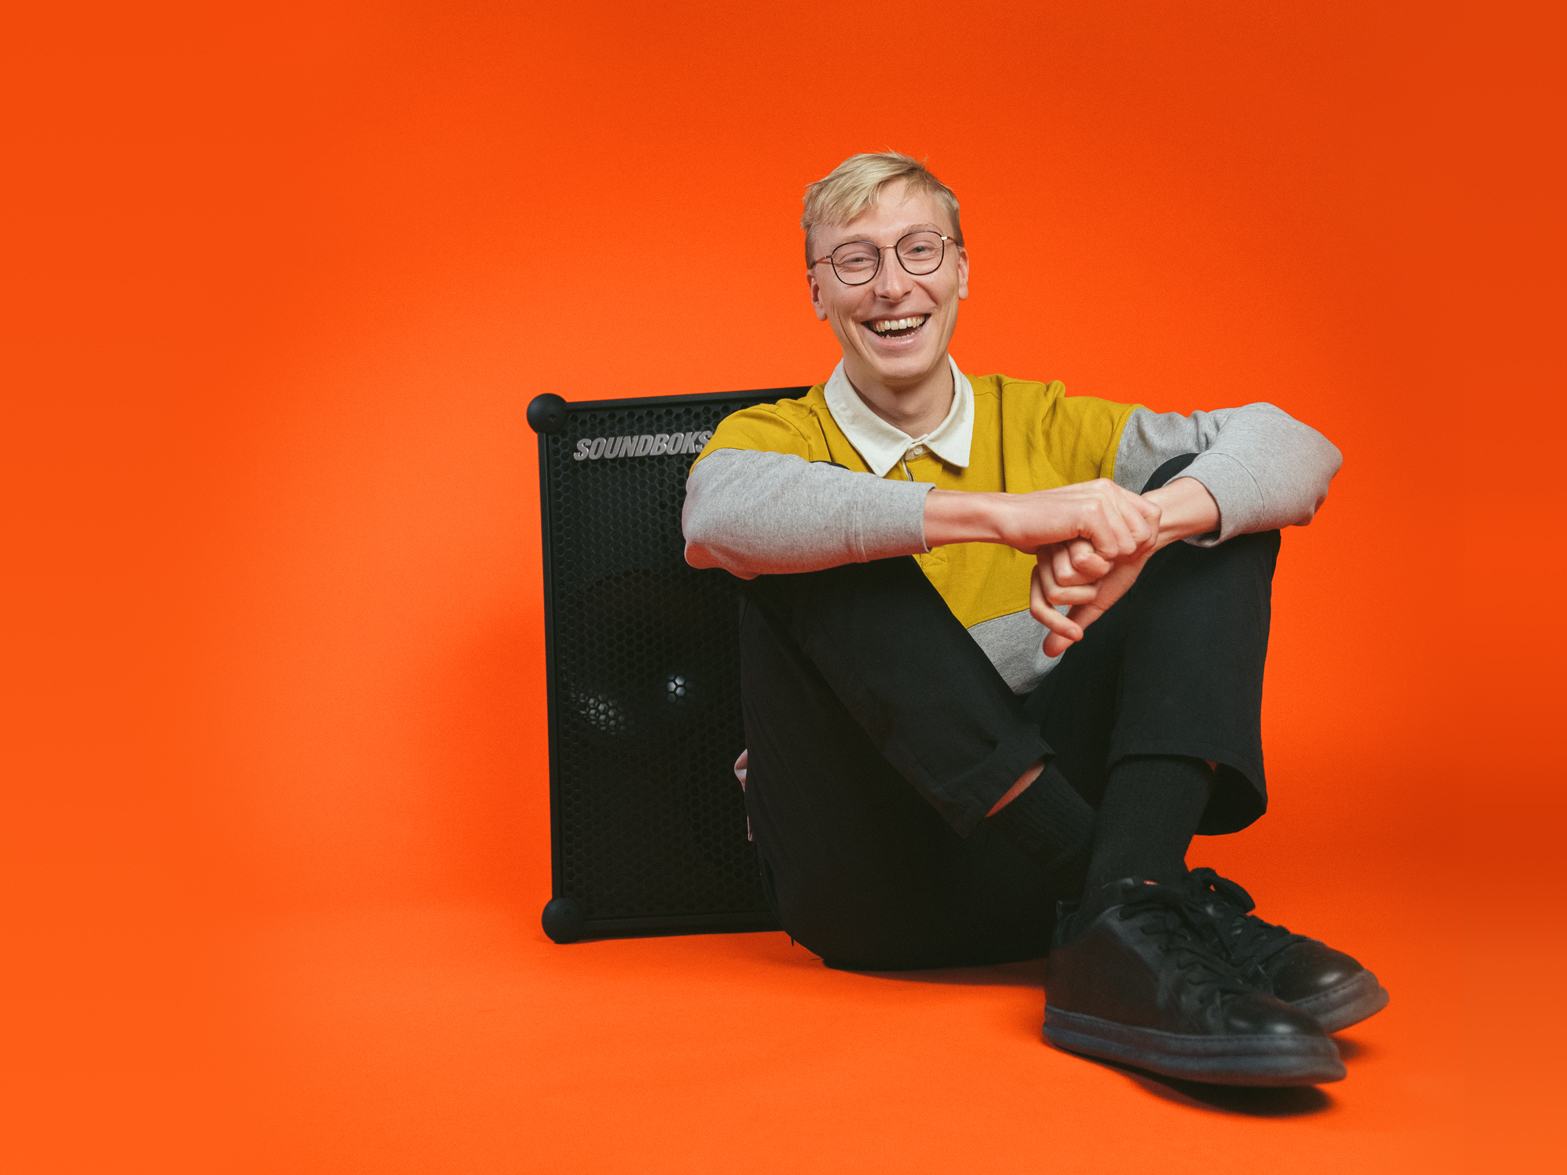 Jesper, SOUNDBOKS CEO in front of an orange background